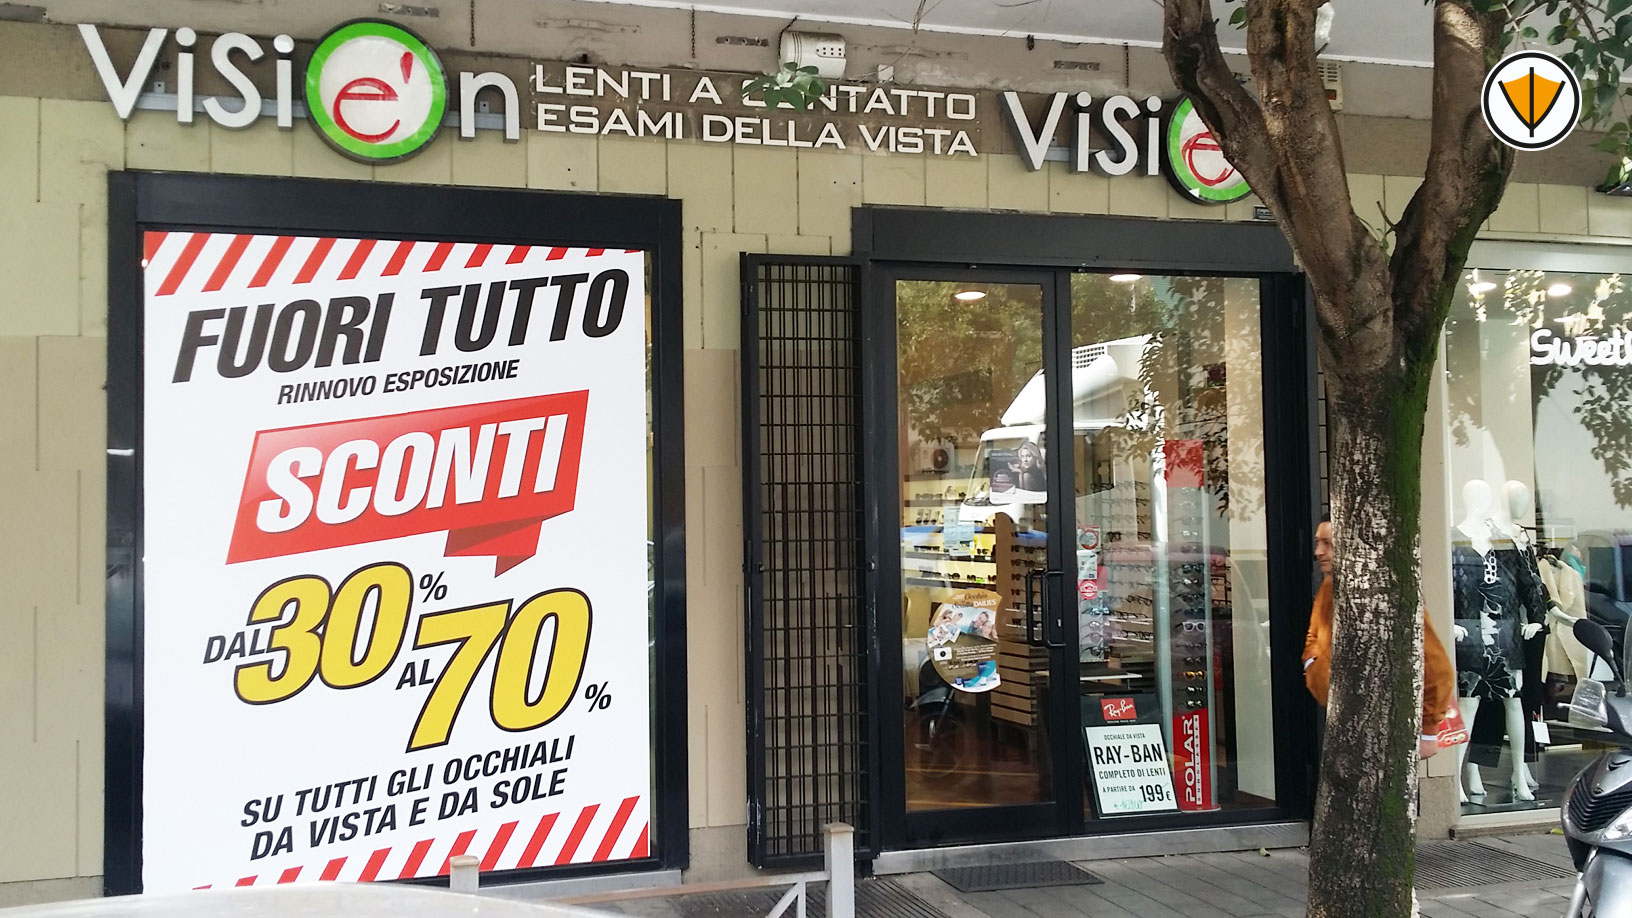 Insegna luminosa Visionè - Roma